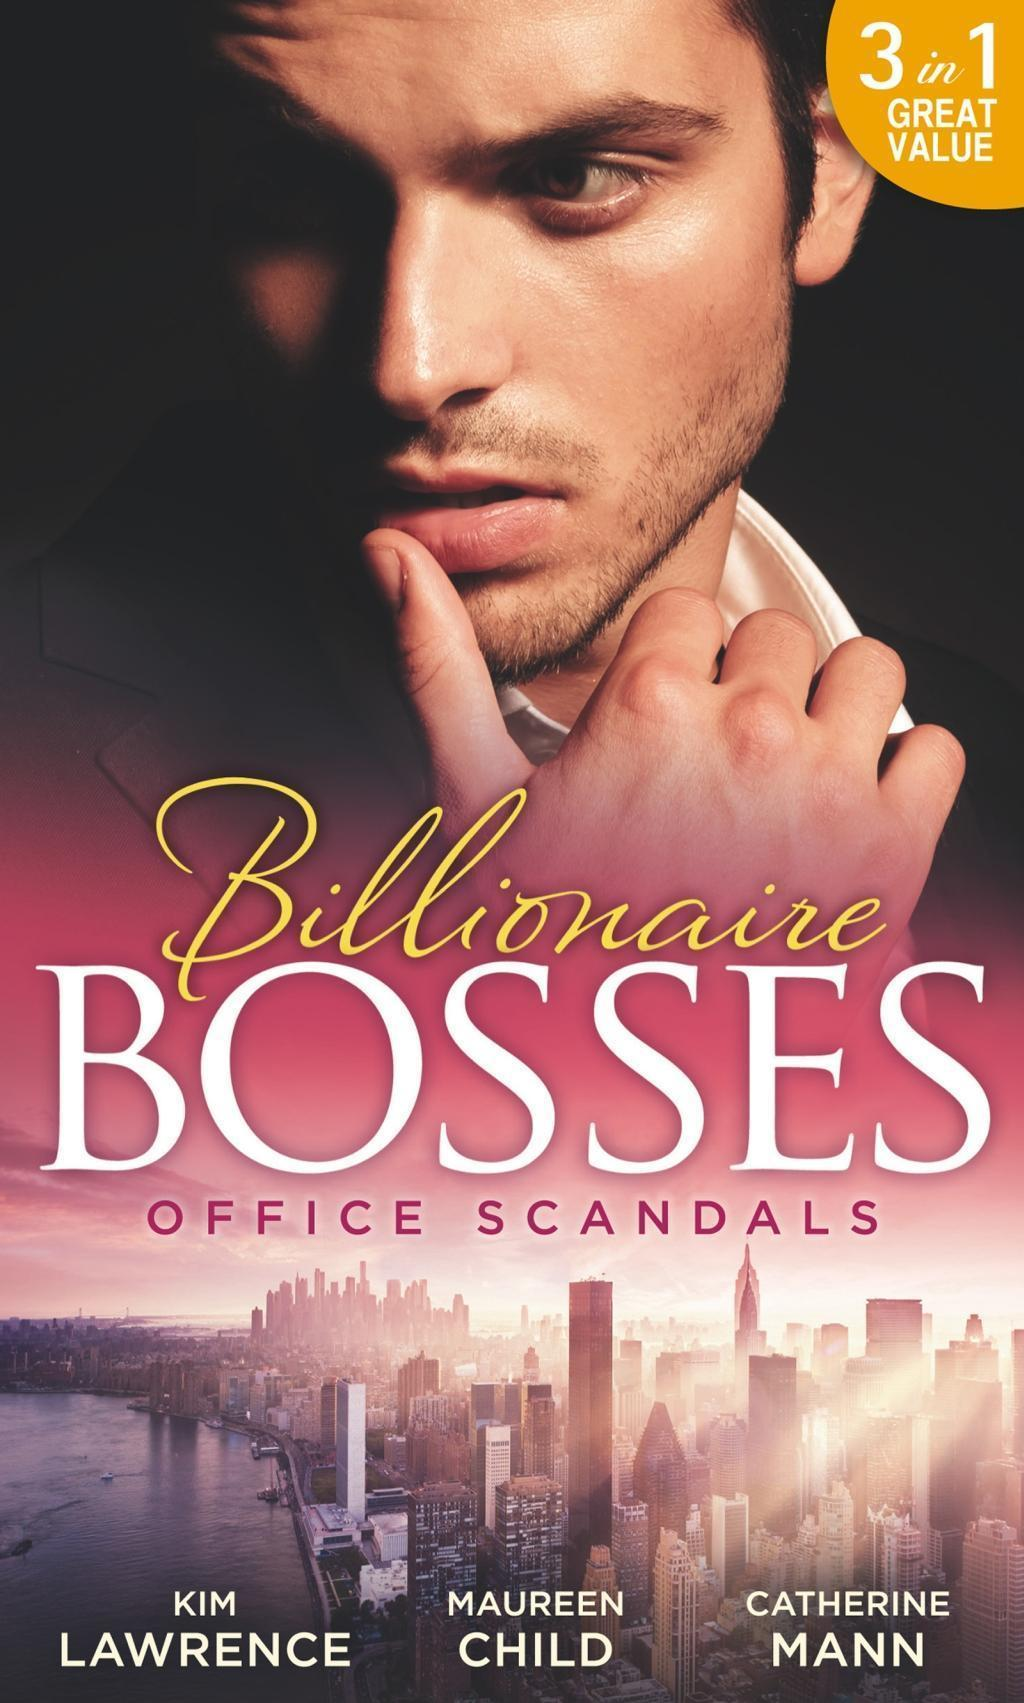 Office Scandals: The Petrelli Heir / Gilded Secrets / An Inconvenient Affair (Mills & Boon M&B)